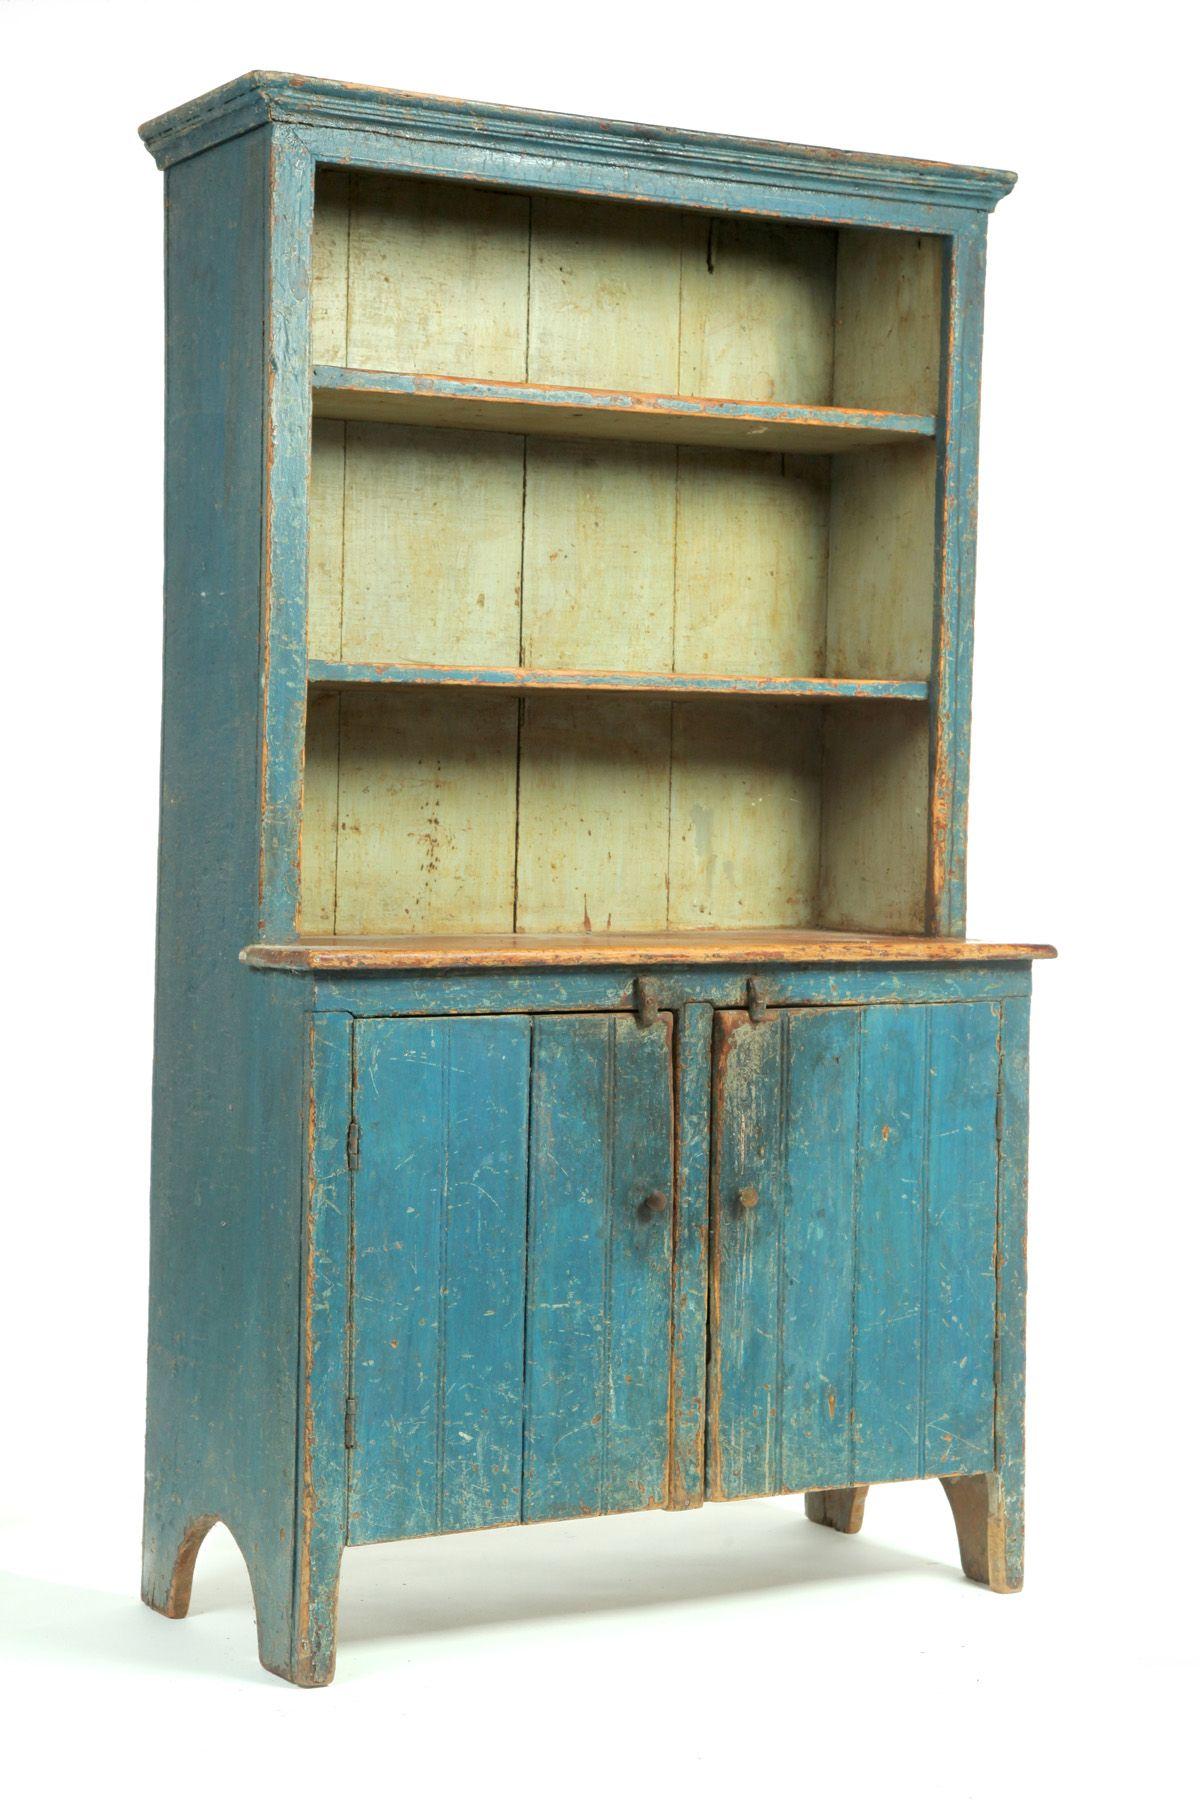 OPEN-TOP CUPBOARD. American, 1st half-19th century, pine. Measures 63.5